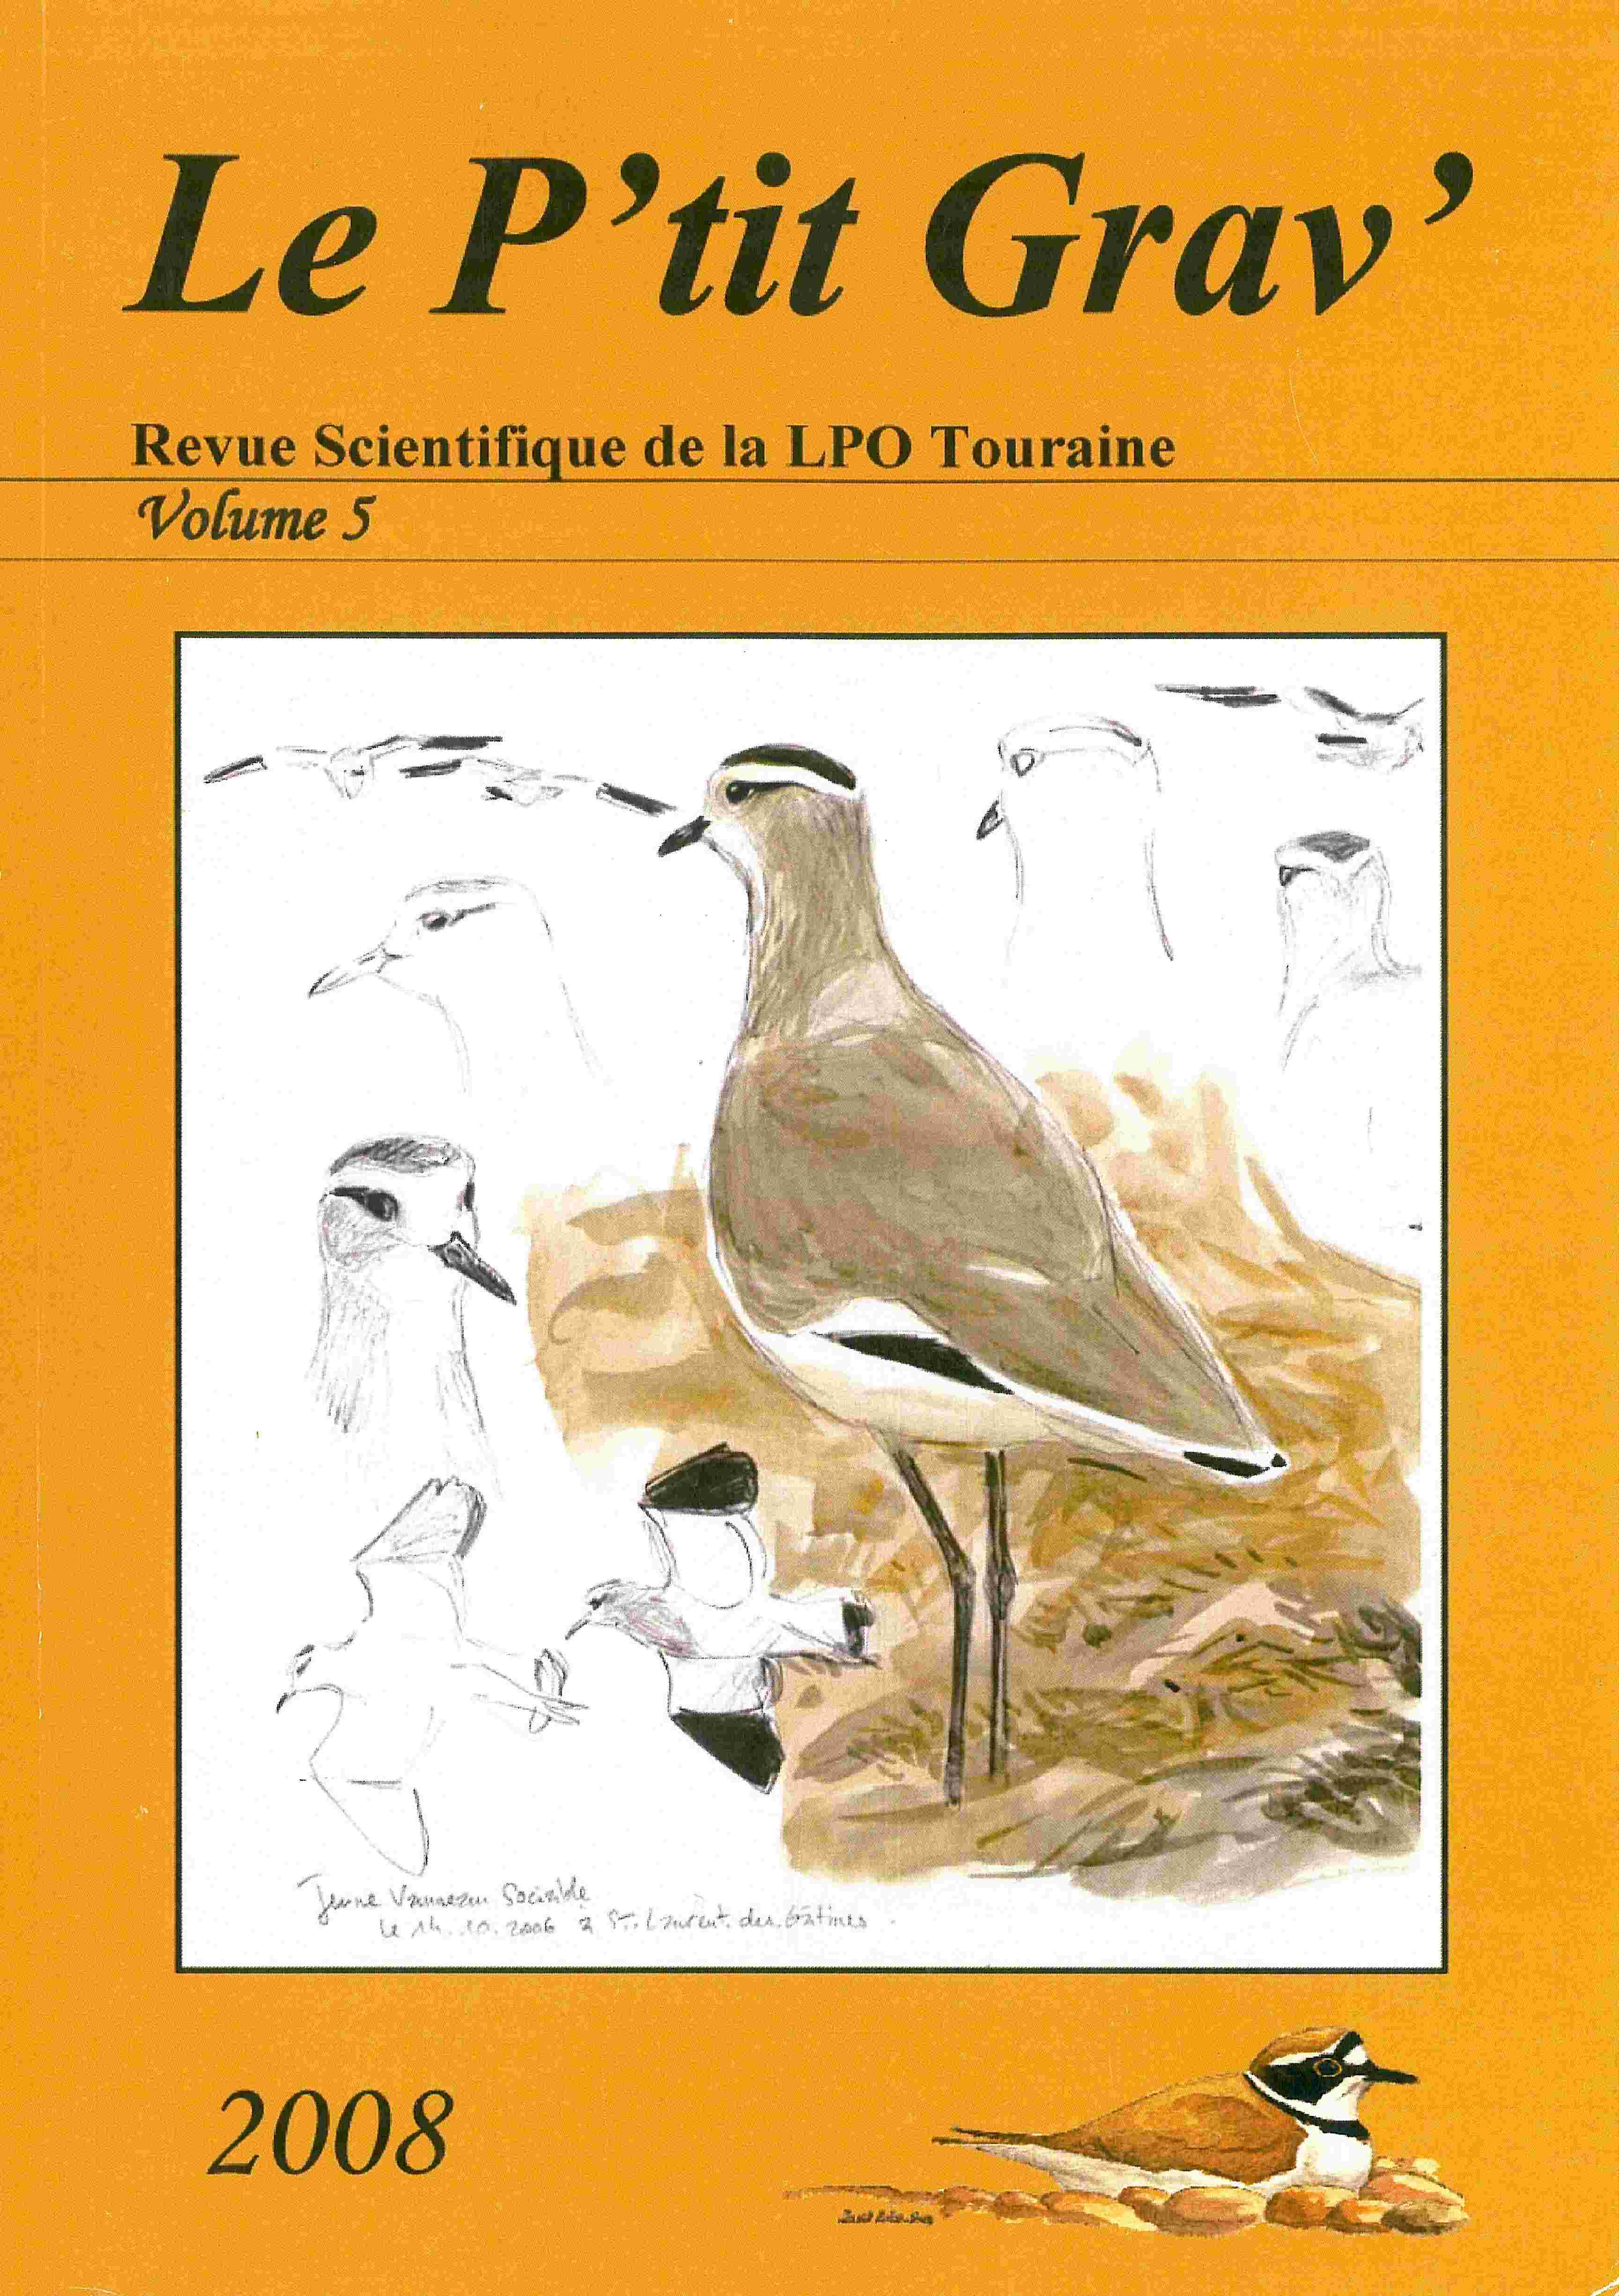 https://cdnfiles2.biolovision.net/www.faune-touraine.org/userfiles/MonDossier/PtitGravvol5.jpg